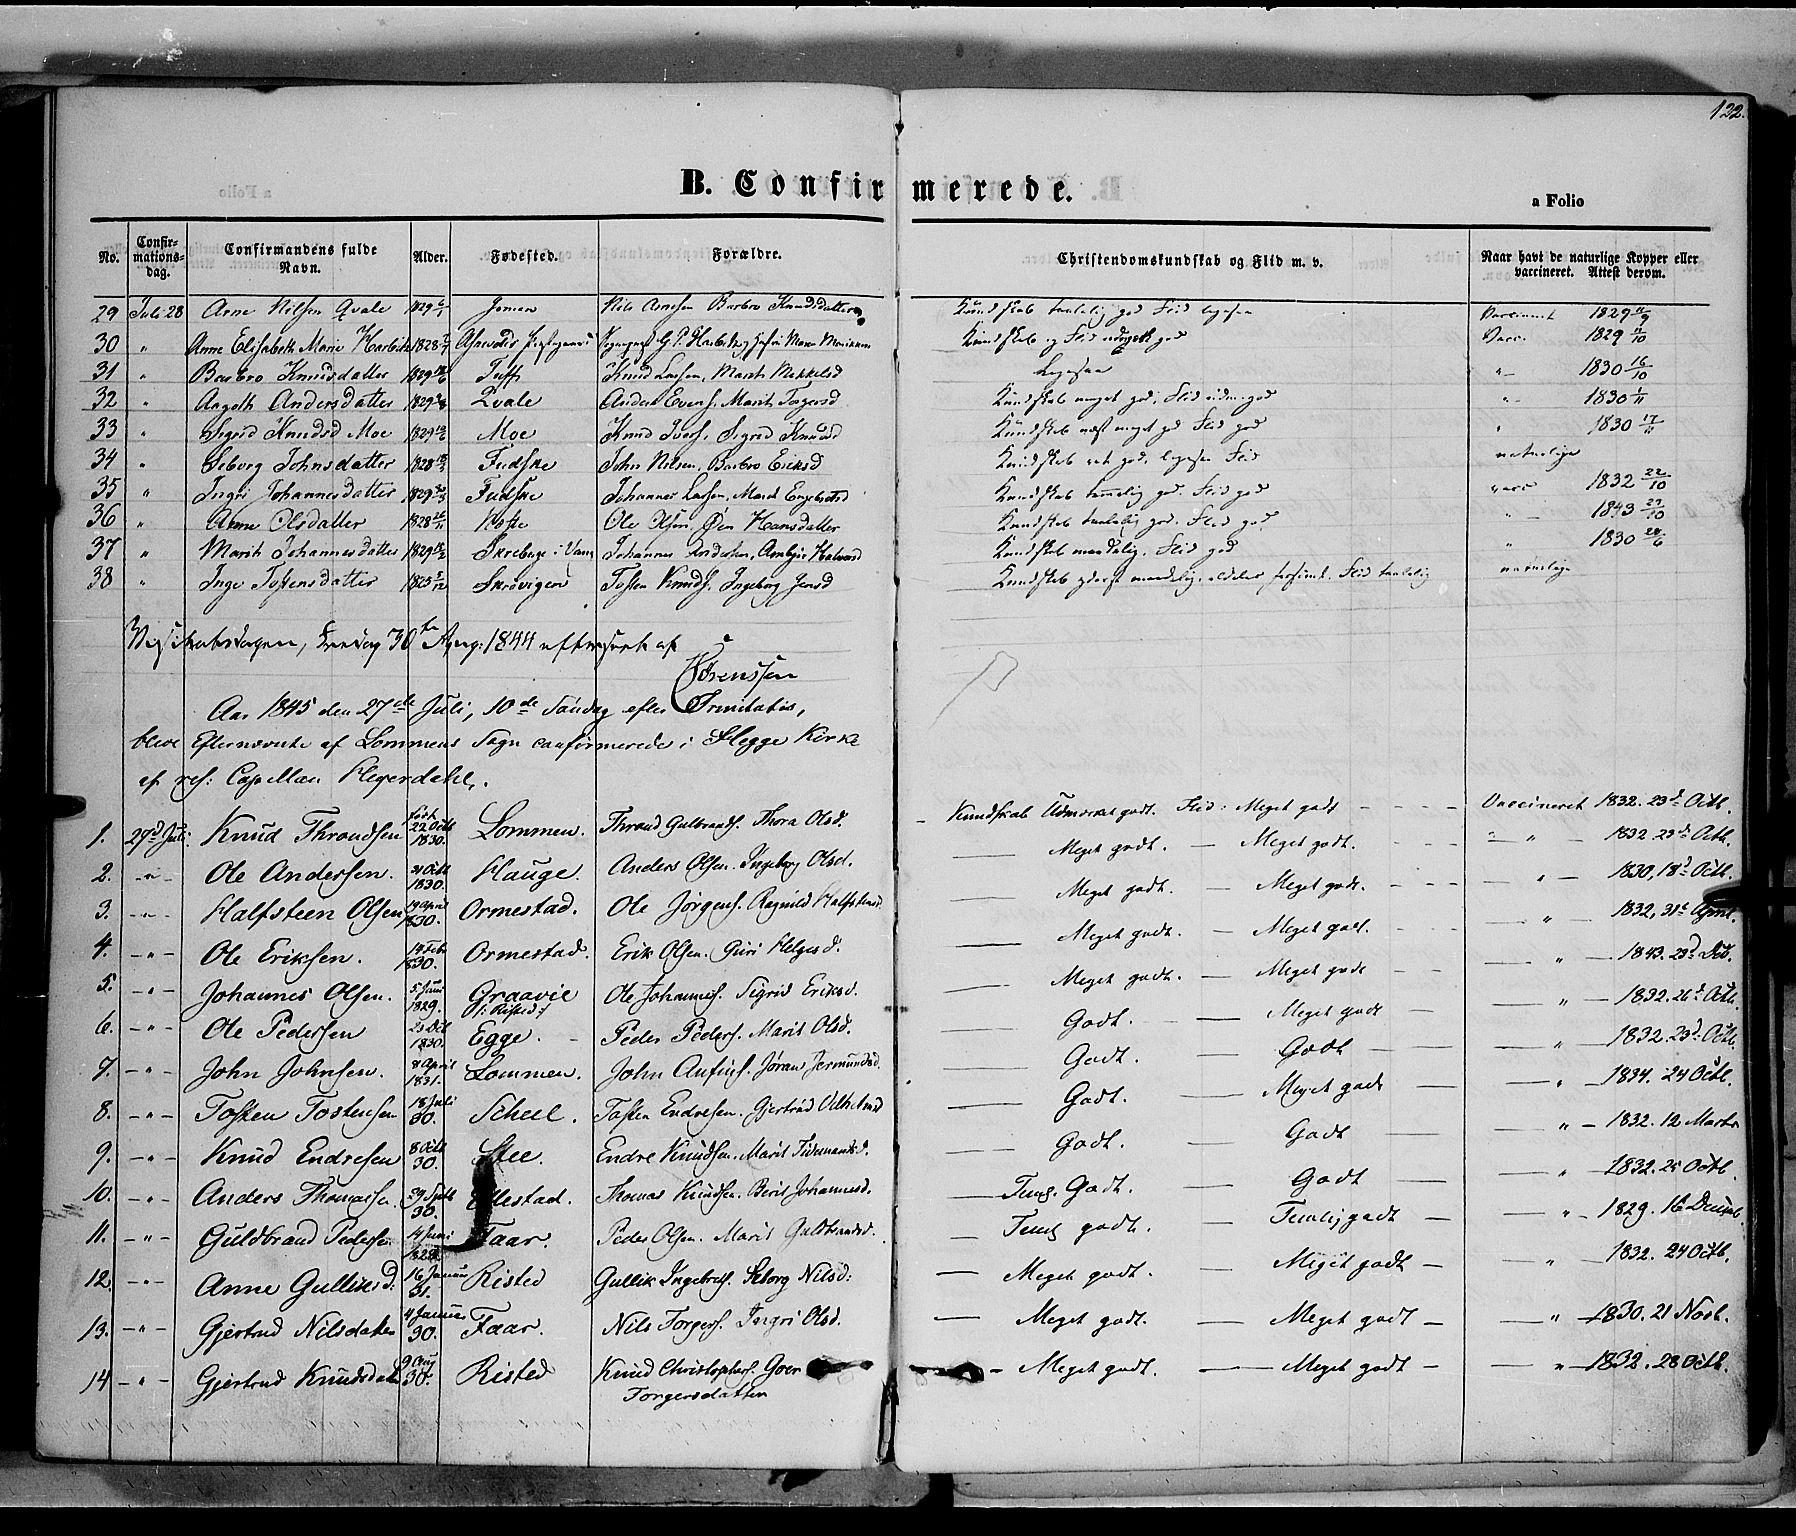 SAH, Vestre Slidre prestekontor, Ministerialbok nr. 1, 1844-1855, s. 122